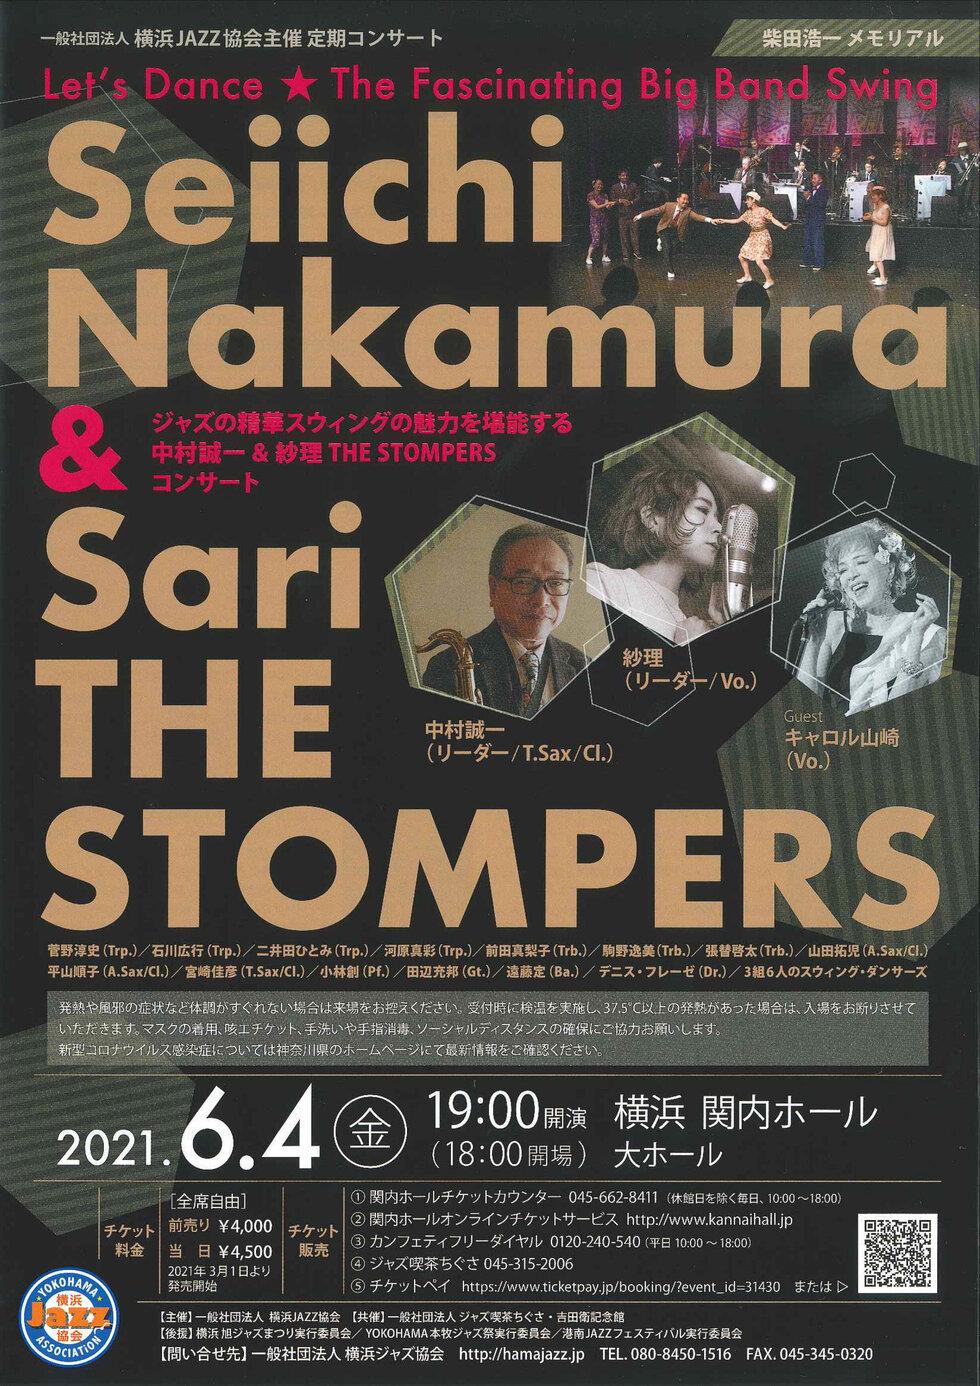 Seiichi Nakamura & Sari THE STOMPERS≪Let's Dance★The Fascinating Big Band Swing≫ 公演延期とチケット再販売のお知らせ(3月1日更新)の写真